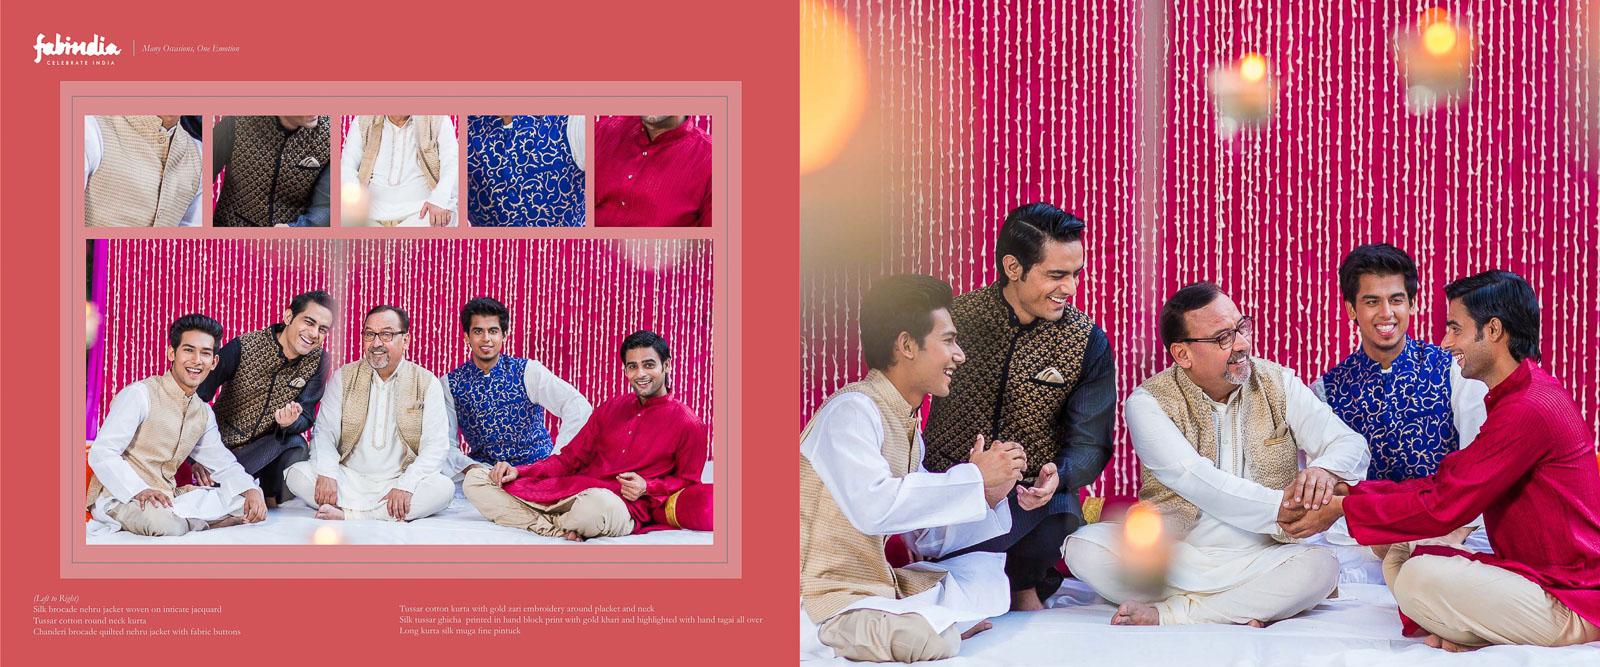 Fashion-Photographer-Fabindia-Ethnic-RamitBatra_11